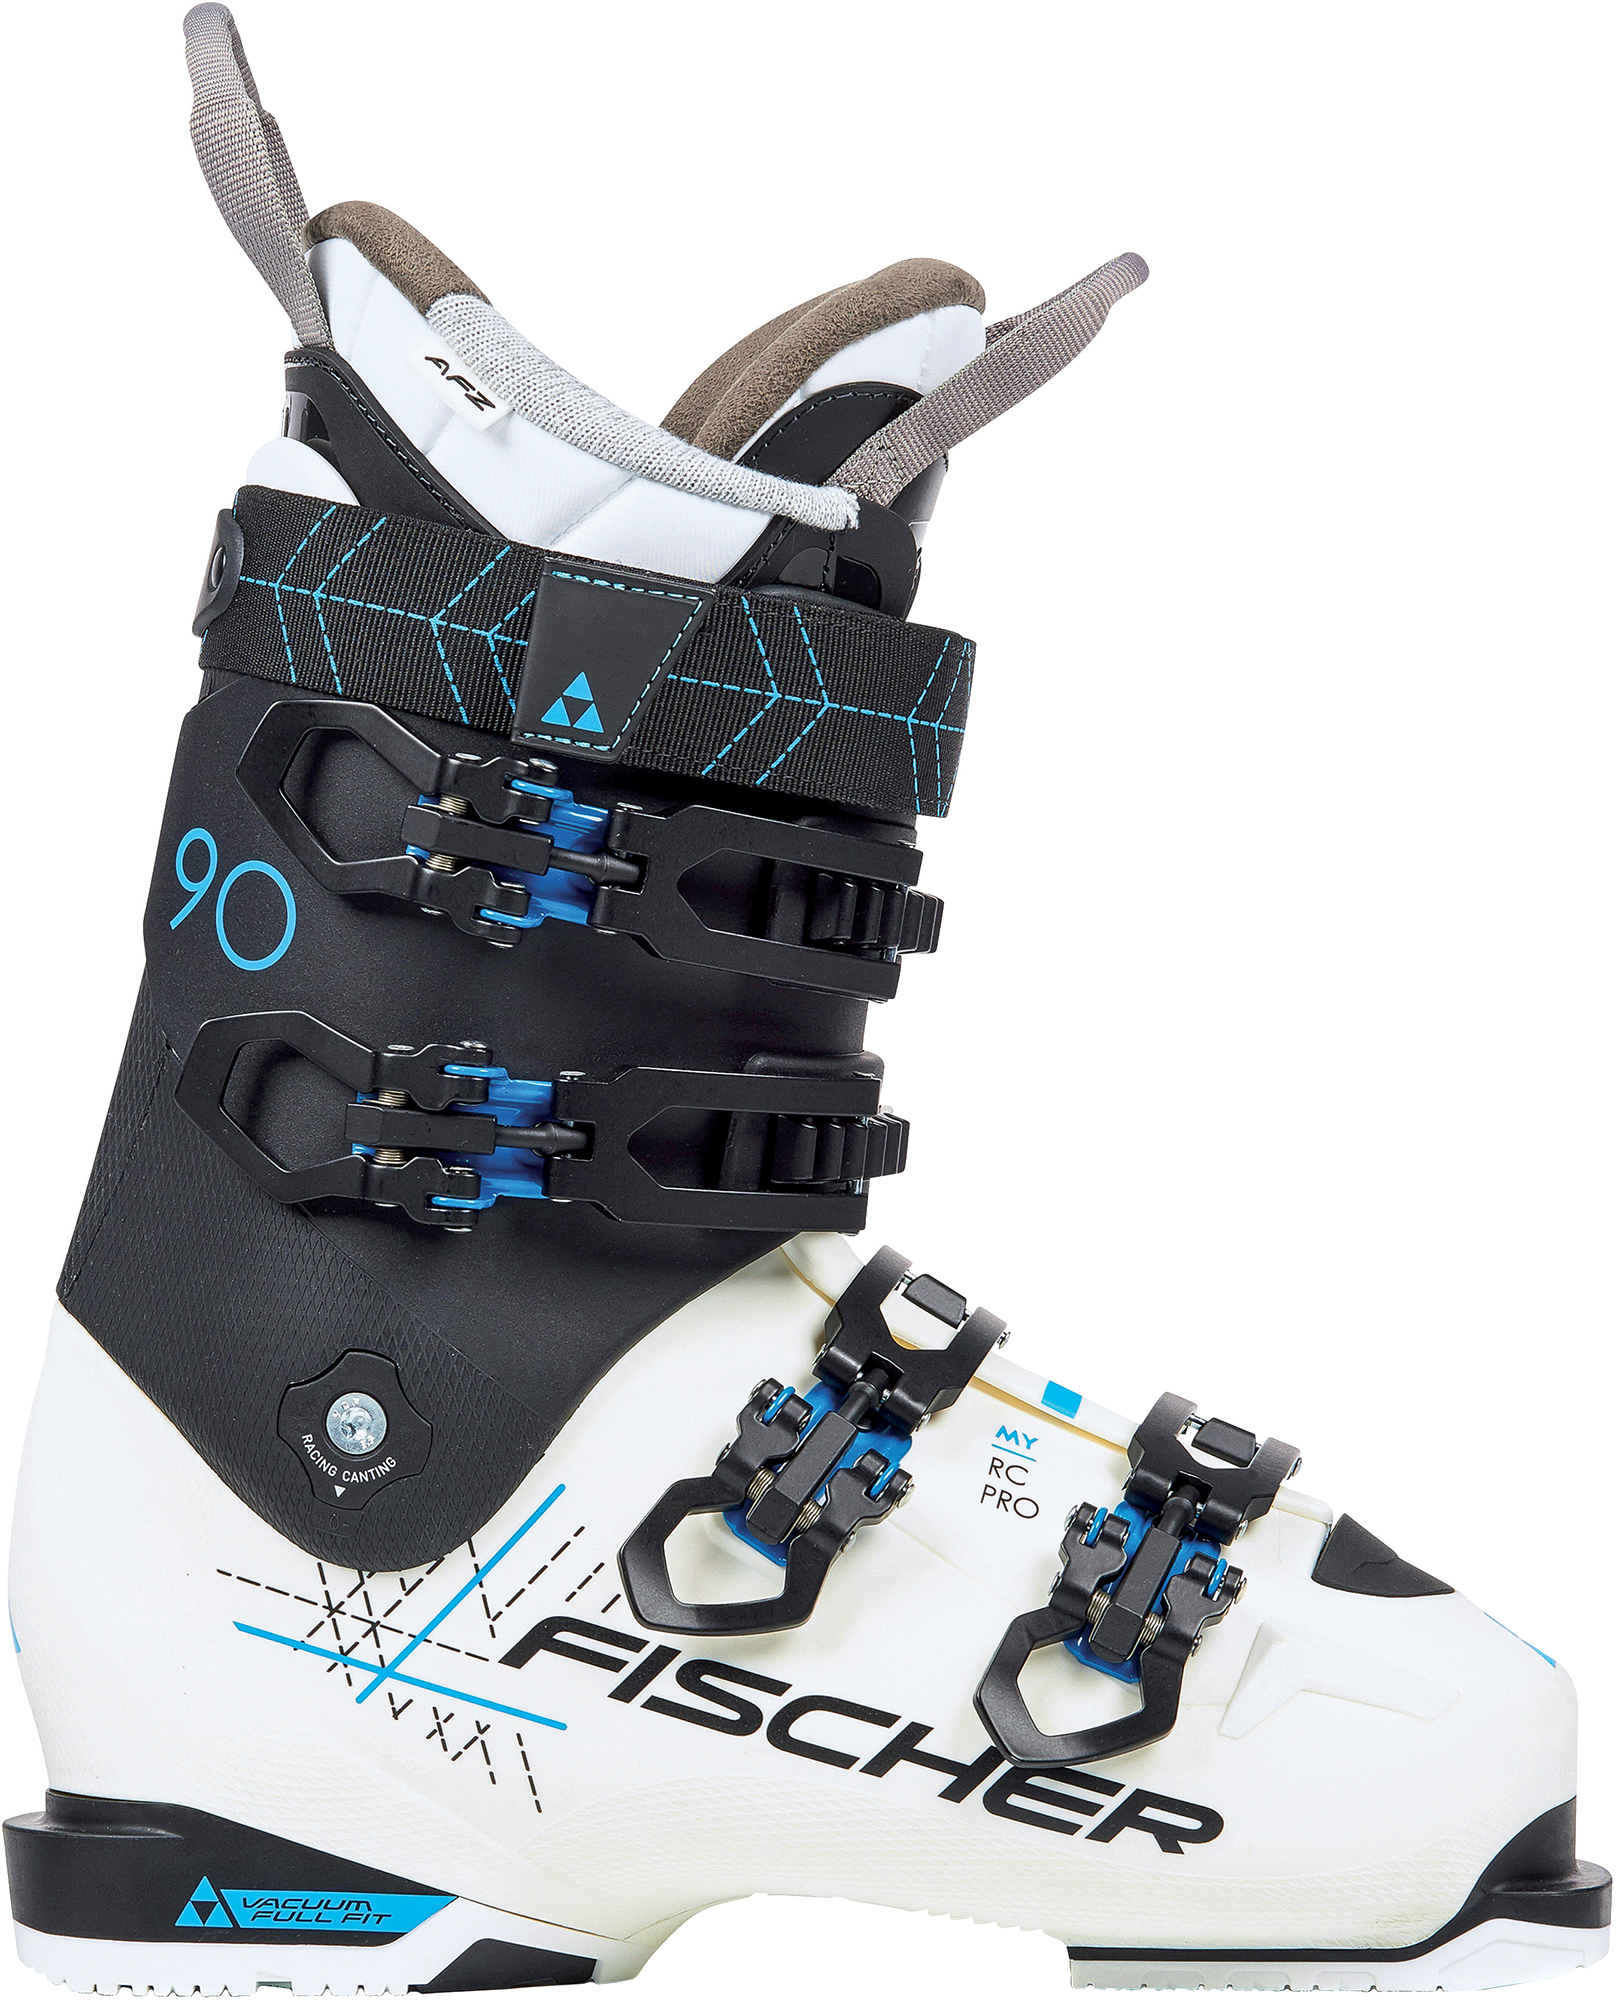 Fischer Ботинки горнолыжные женские Fischer My Rc Pro 90 Vacuum Full Fit, размер 38,5